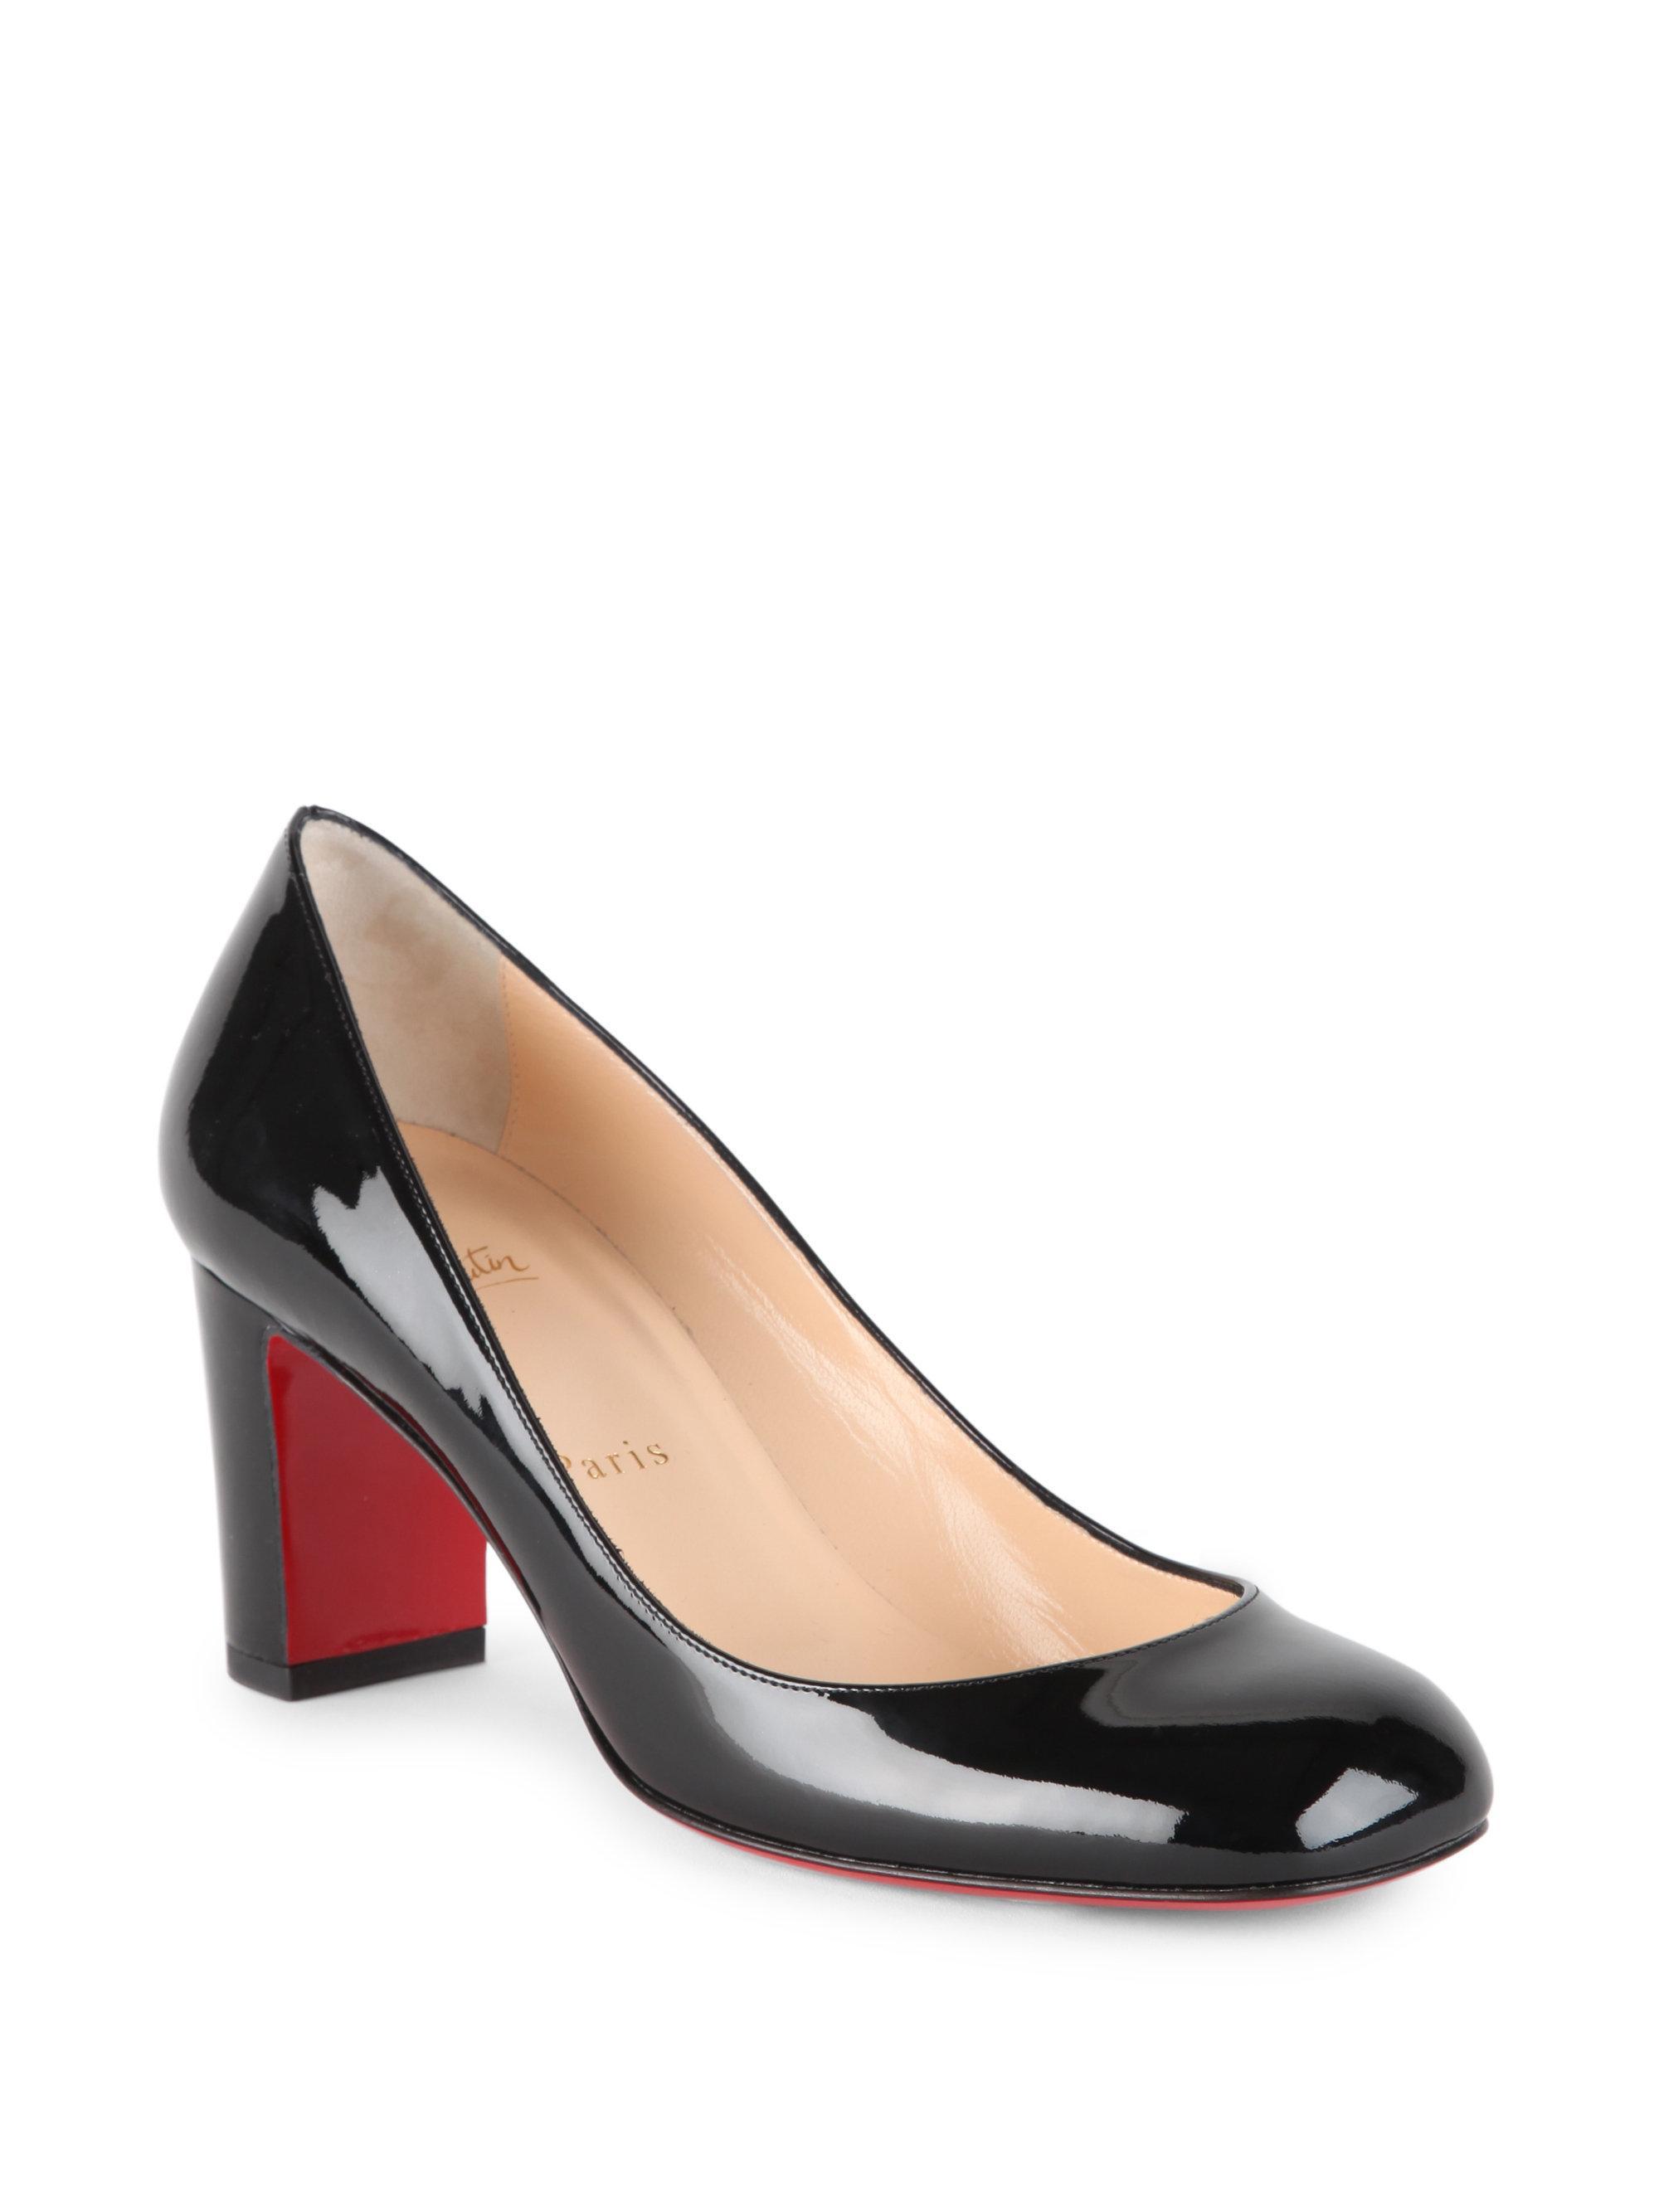 f7c62ffdc50 Lyst - Christian Louboutin Cadrilla 70 Patent Leather Block Heel ...